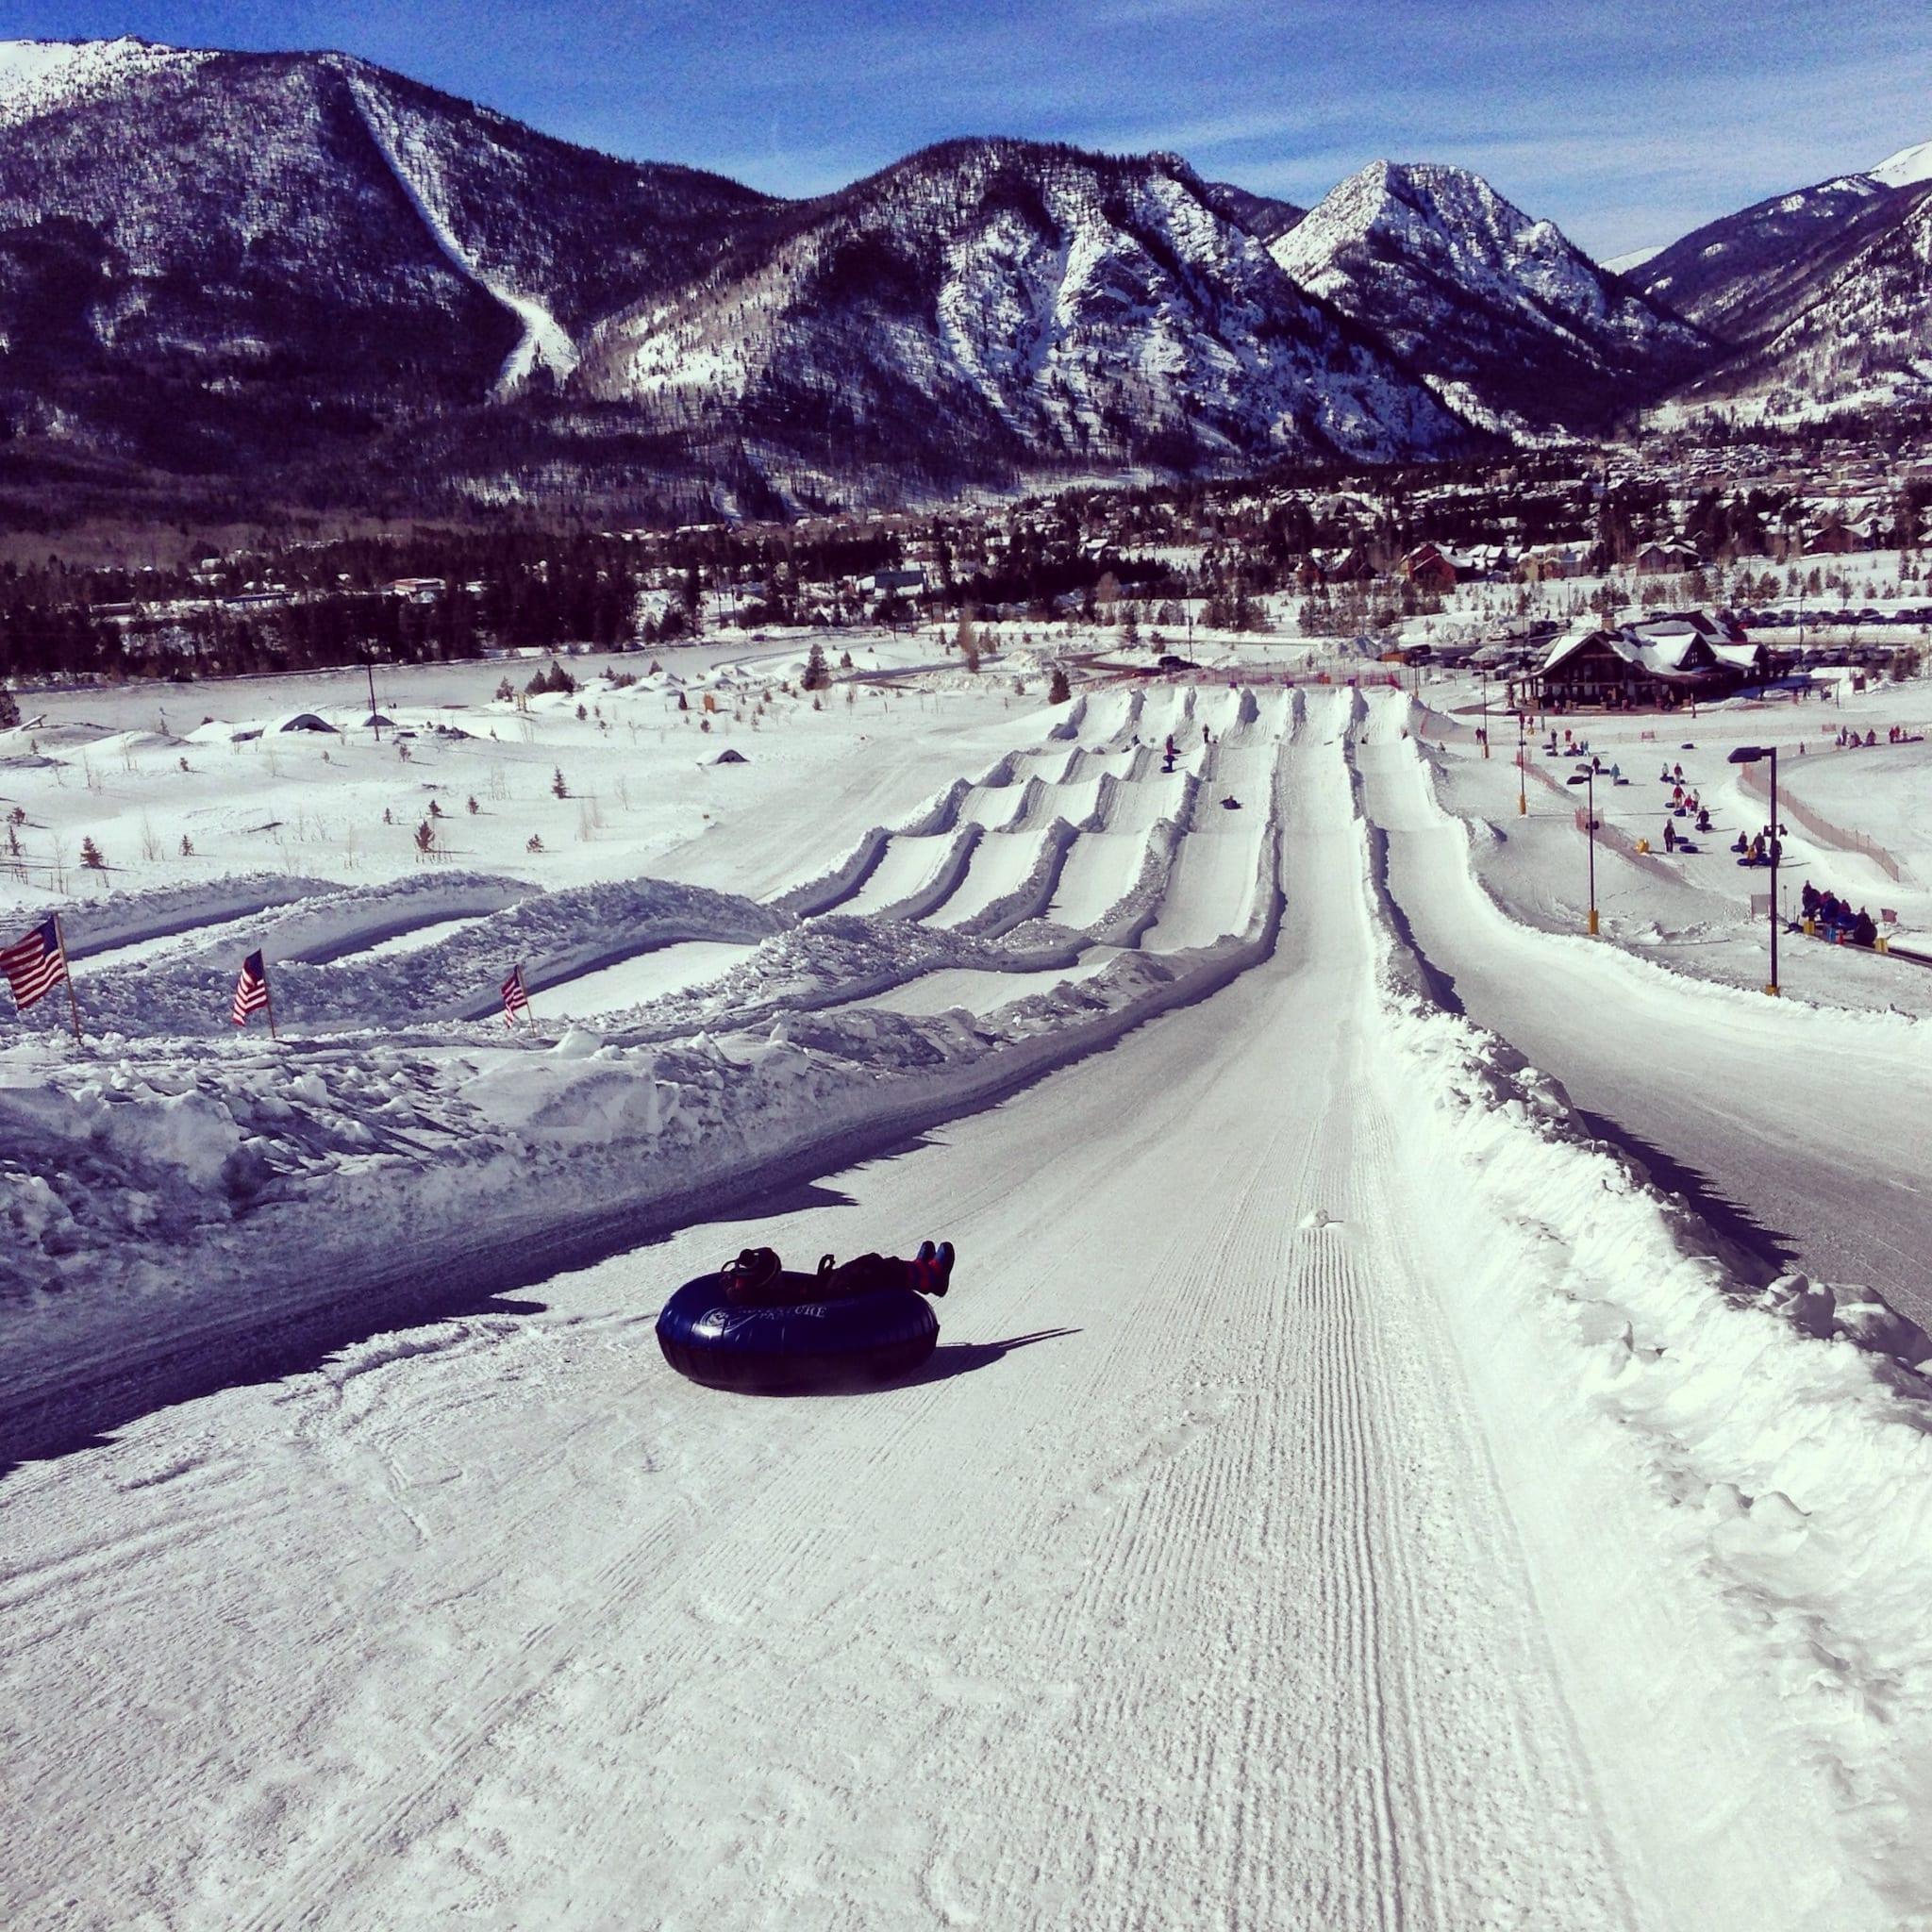 Frisco Snow Tubing Hill Colorado